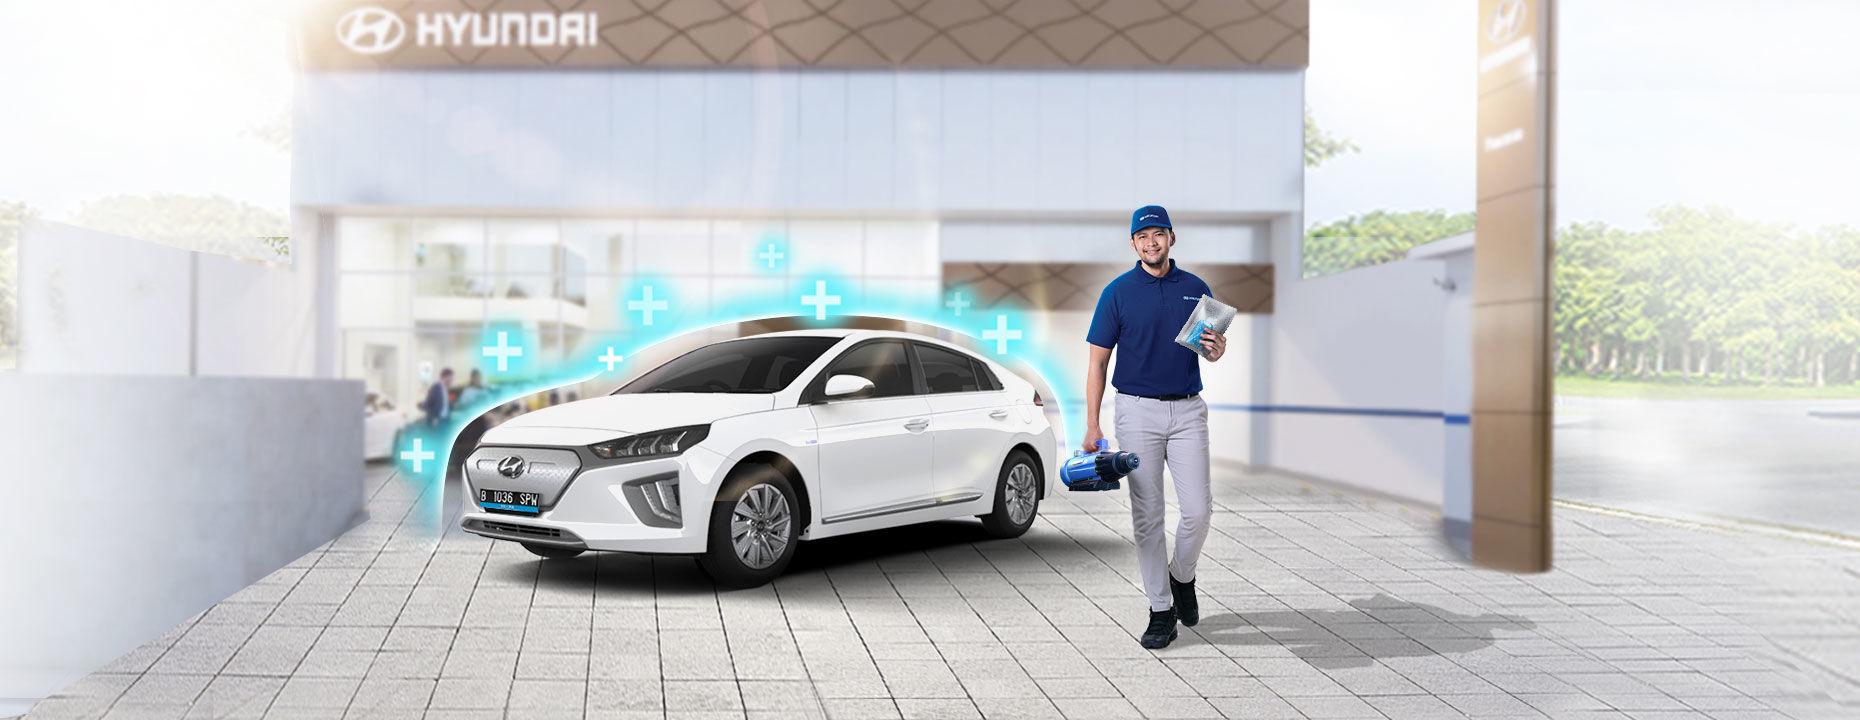 Hyundai Healthy